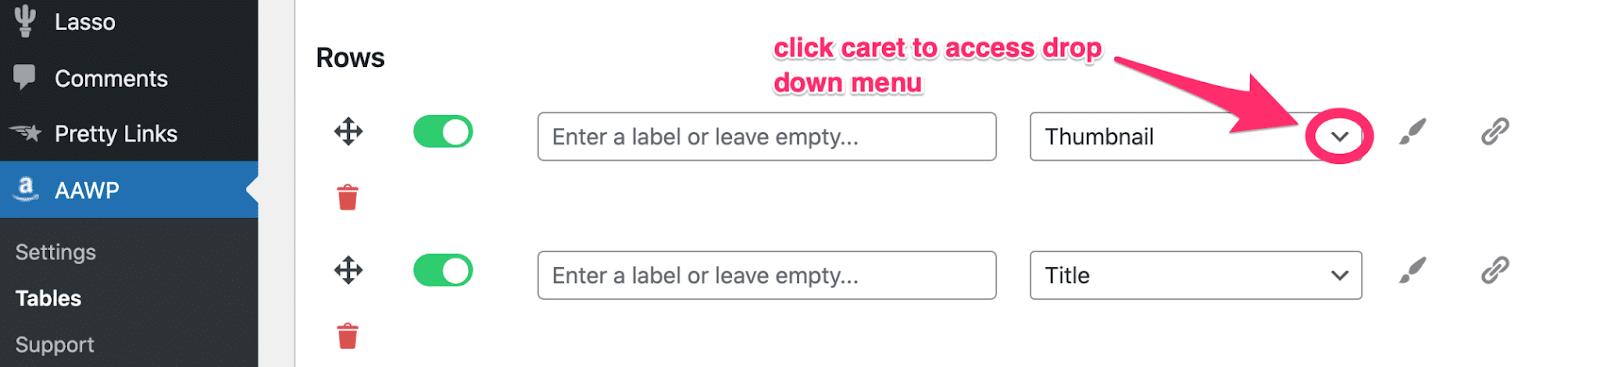 accessing dropdown menu